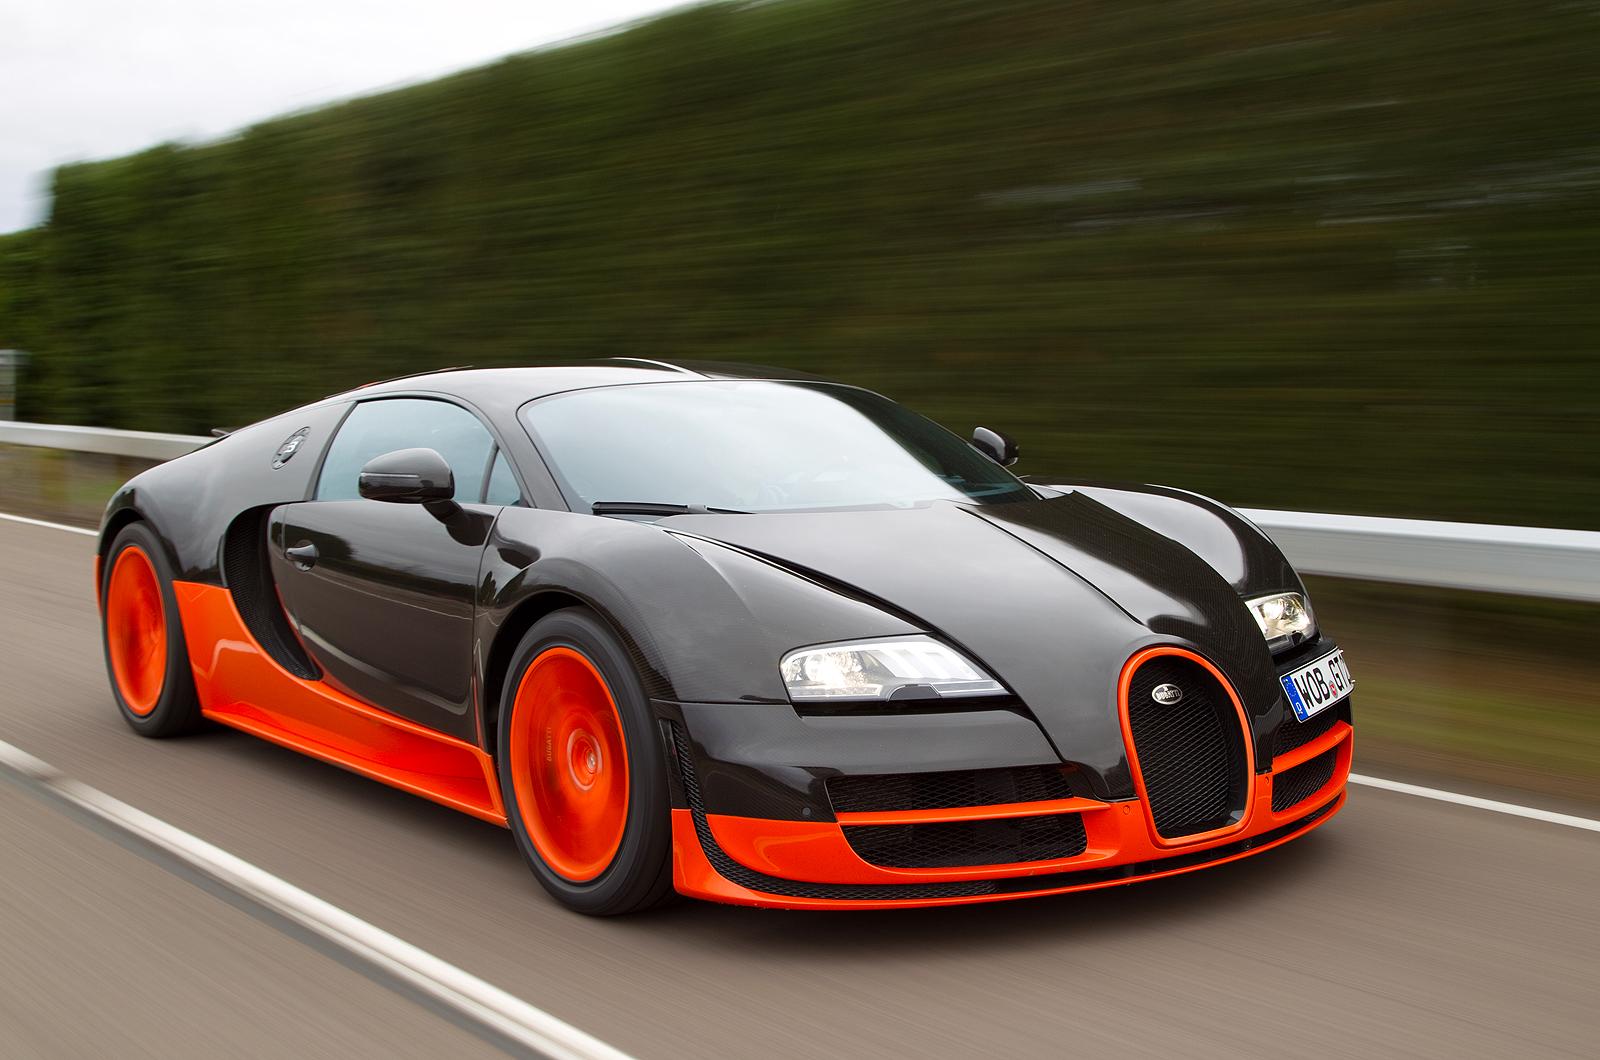 Is the bugatti chiron street legal